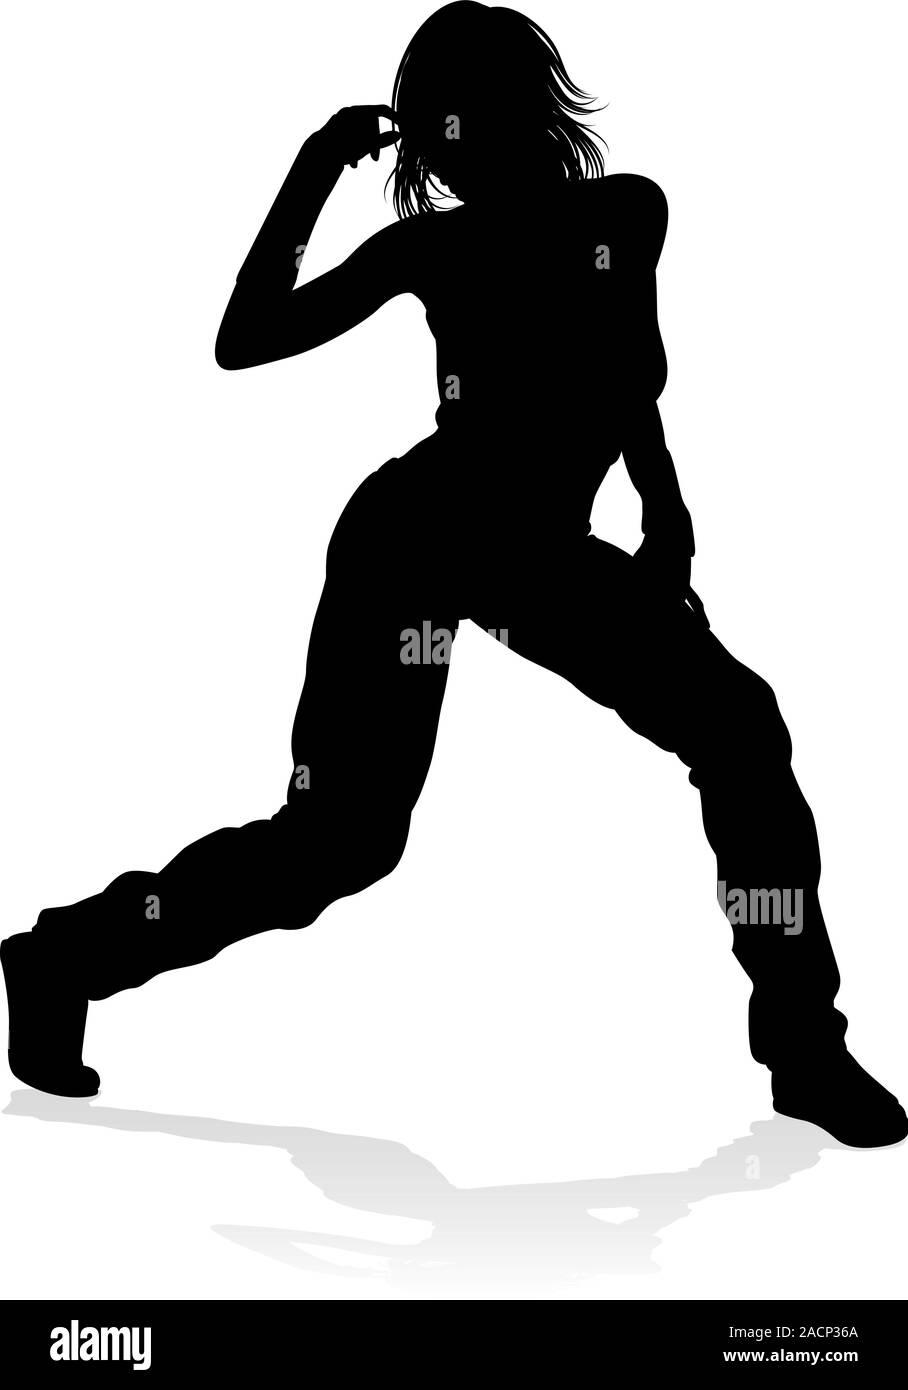 Street Dance Dancer Silhouette Stock Vector Image Art Alamy